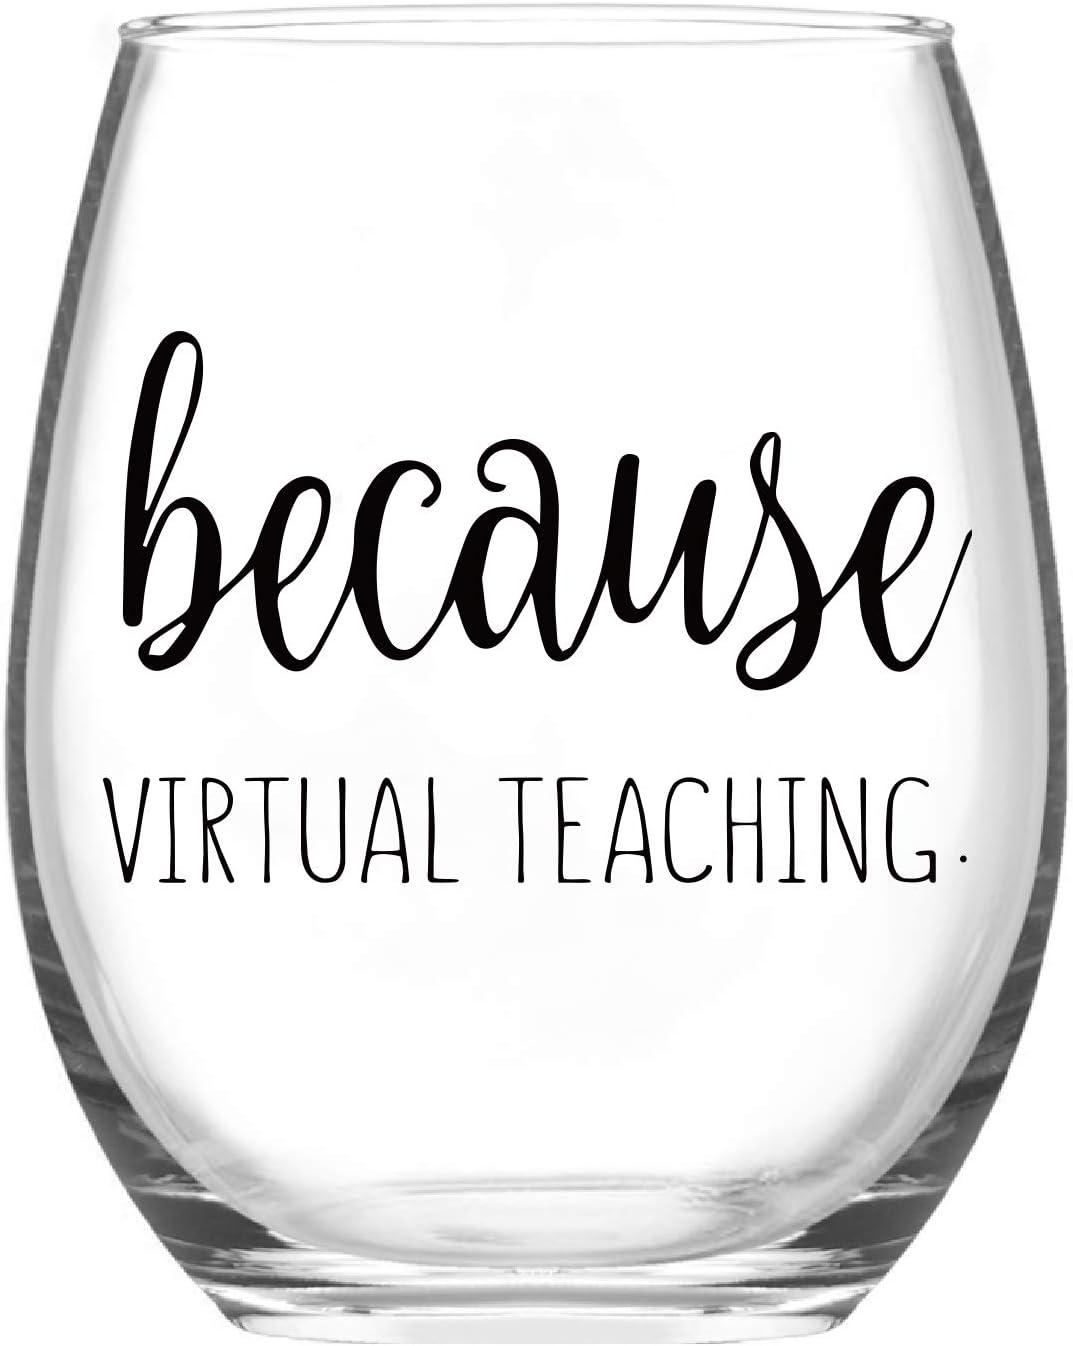 Because Virtual Teaching Wine Glass, Teacher Stemless Wine Glass for Women, Men, Teachers, Professors, Teaching Assistant - Gift Idea for Teacher Appreciation Day, Birthday, Christmas